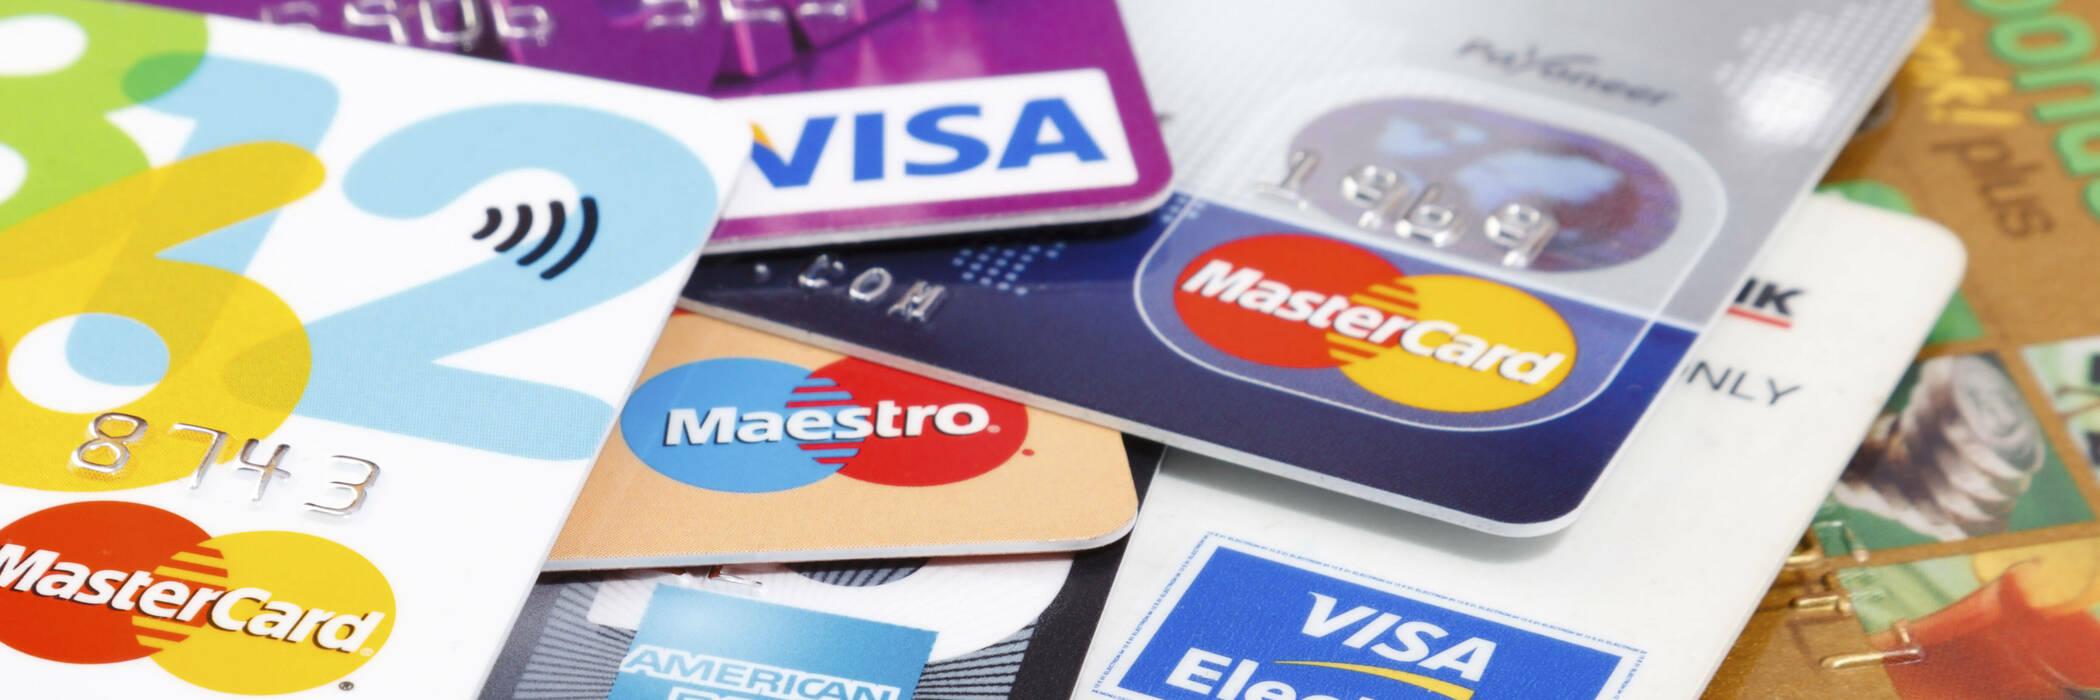 16mar credit card interest rates hero